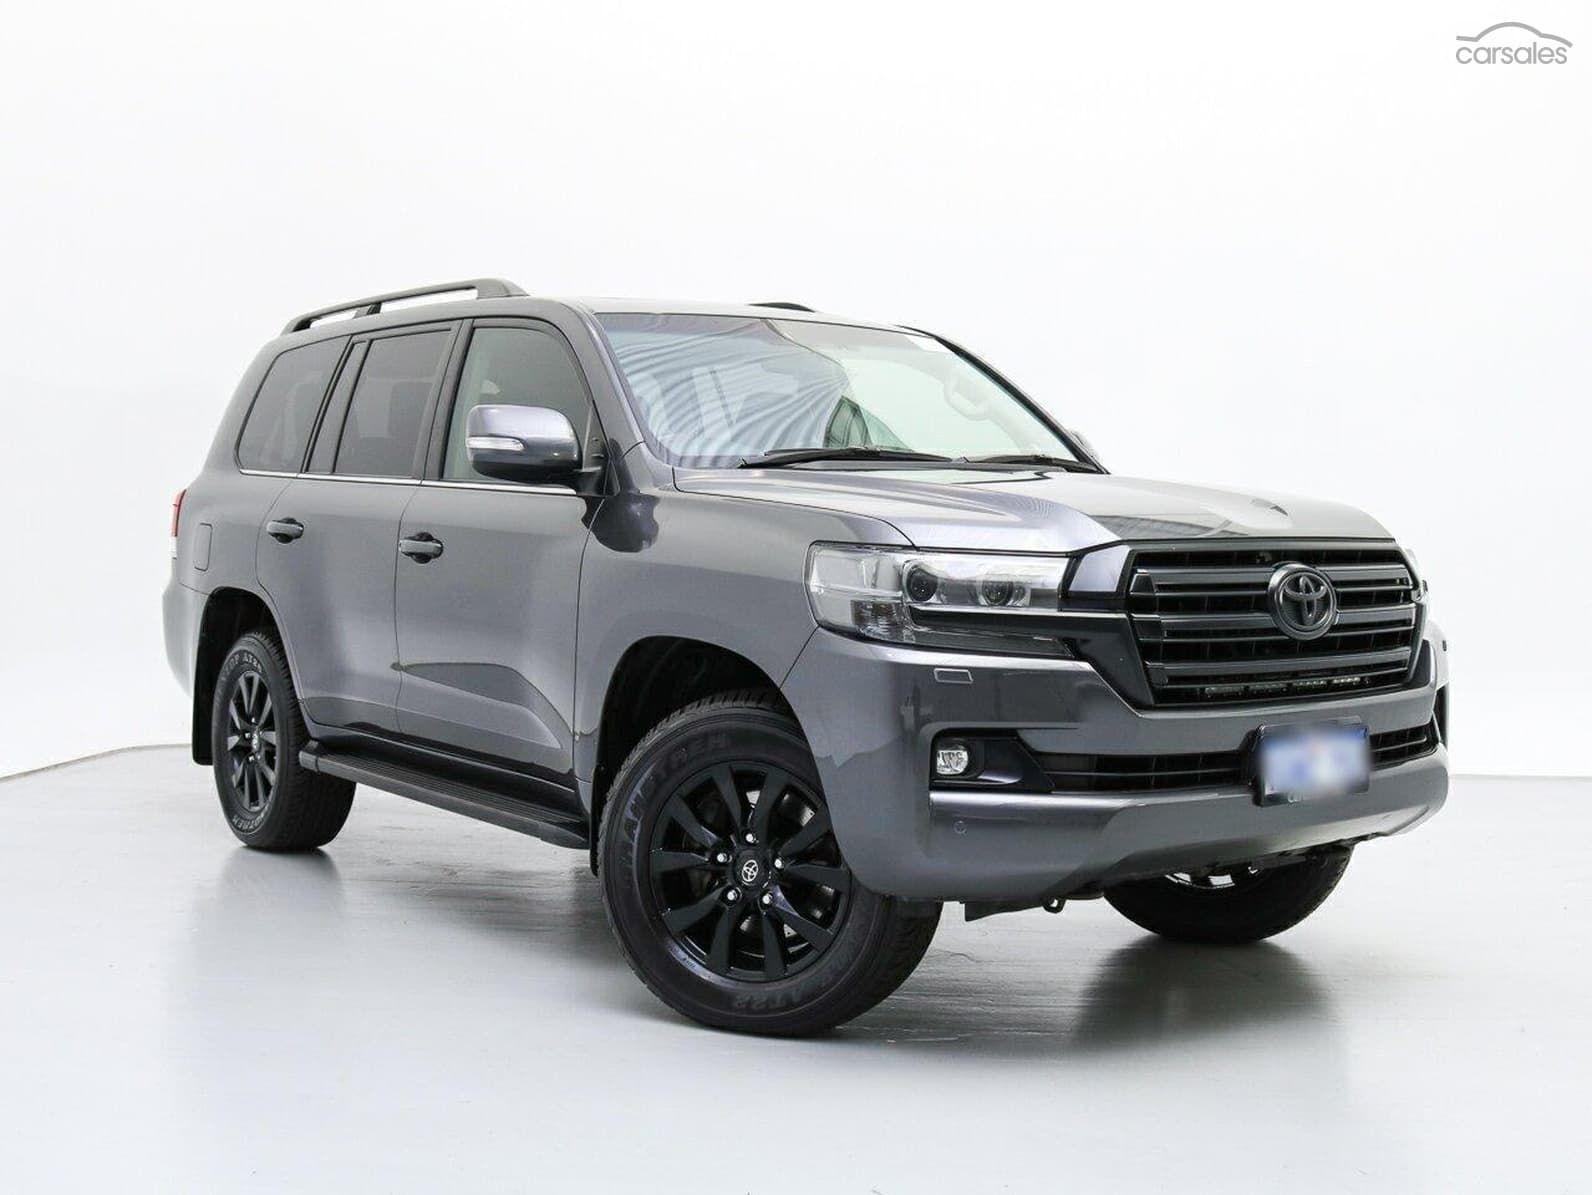 2016 Toyota Landcruiser Vx Auto 4x4 Oag Ad 18135351 Carsales Com Au Land Cruiser Toyota Land Cruiser Cars For Sale